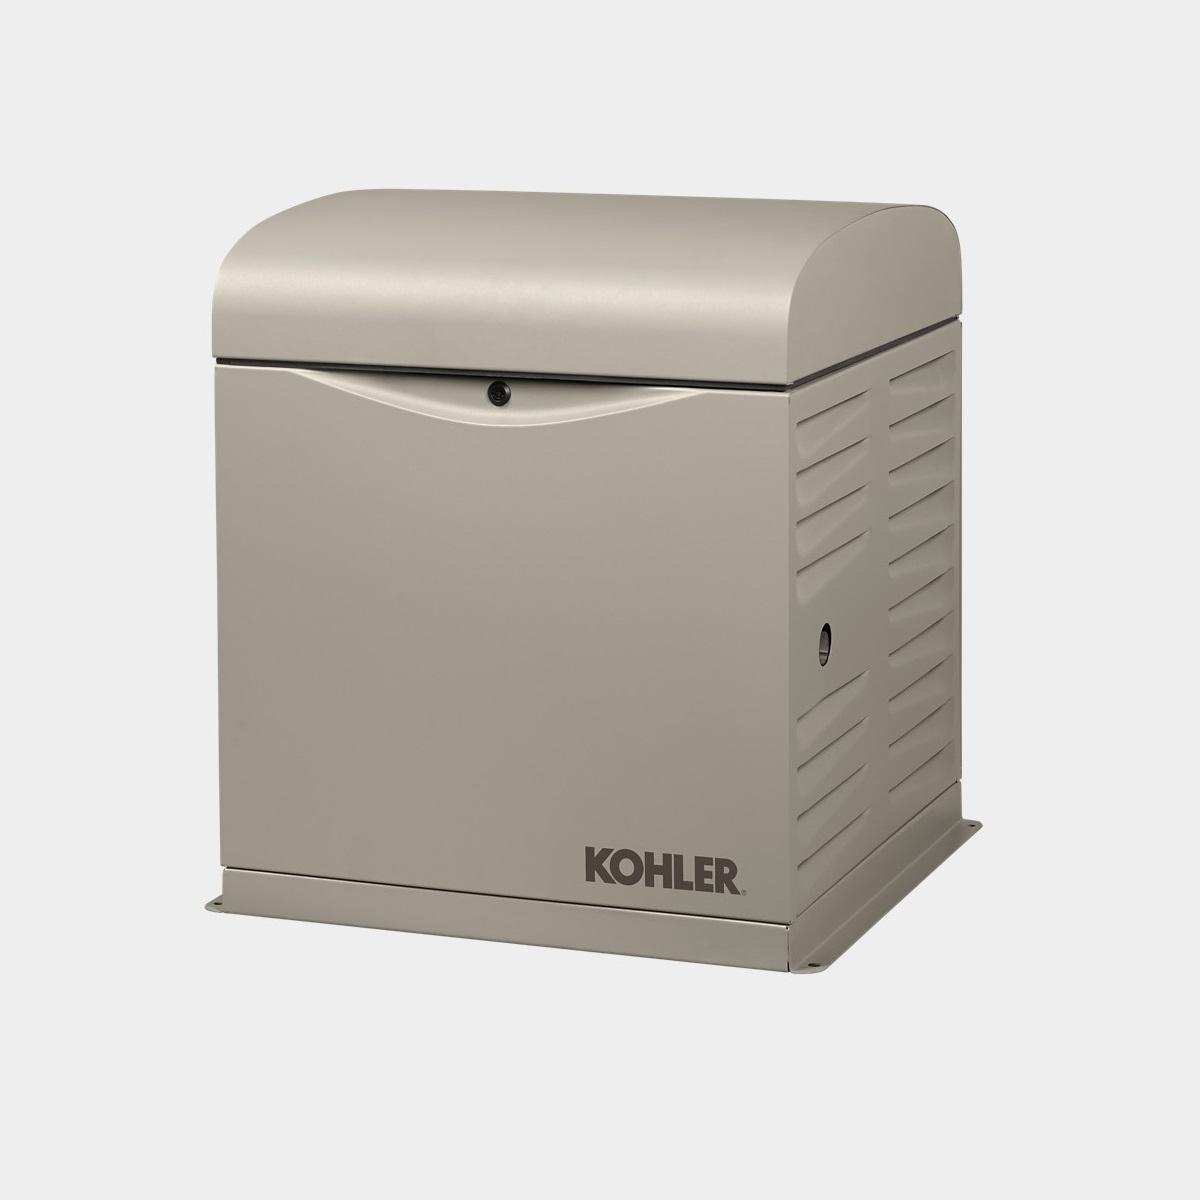 Kohler 8RESV 8 kW Generator